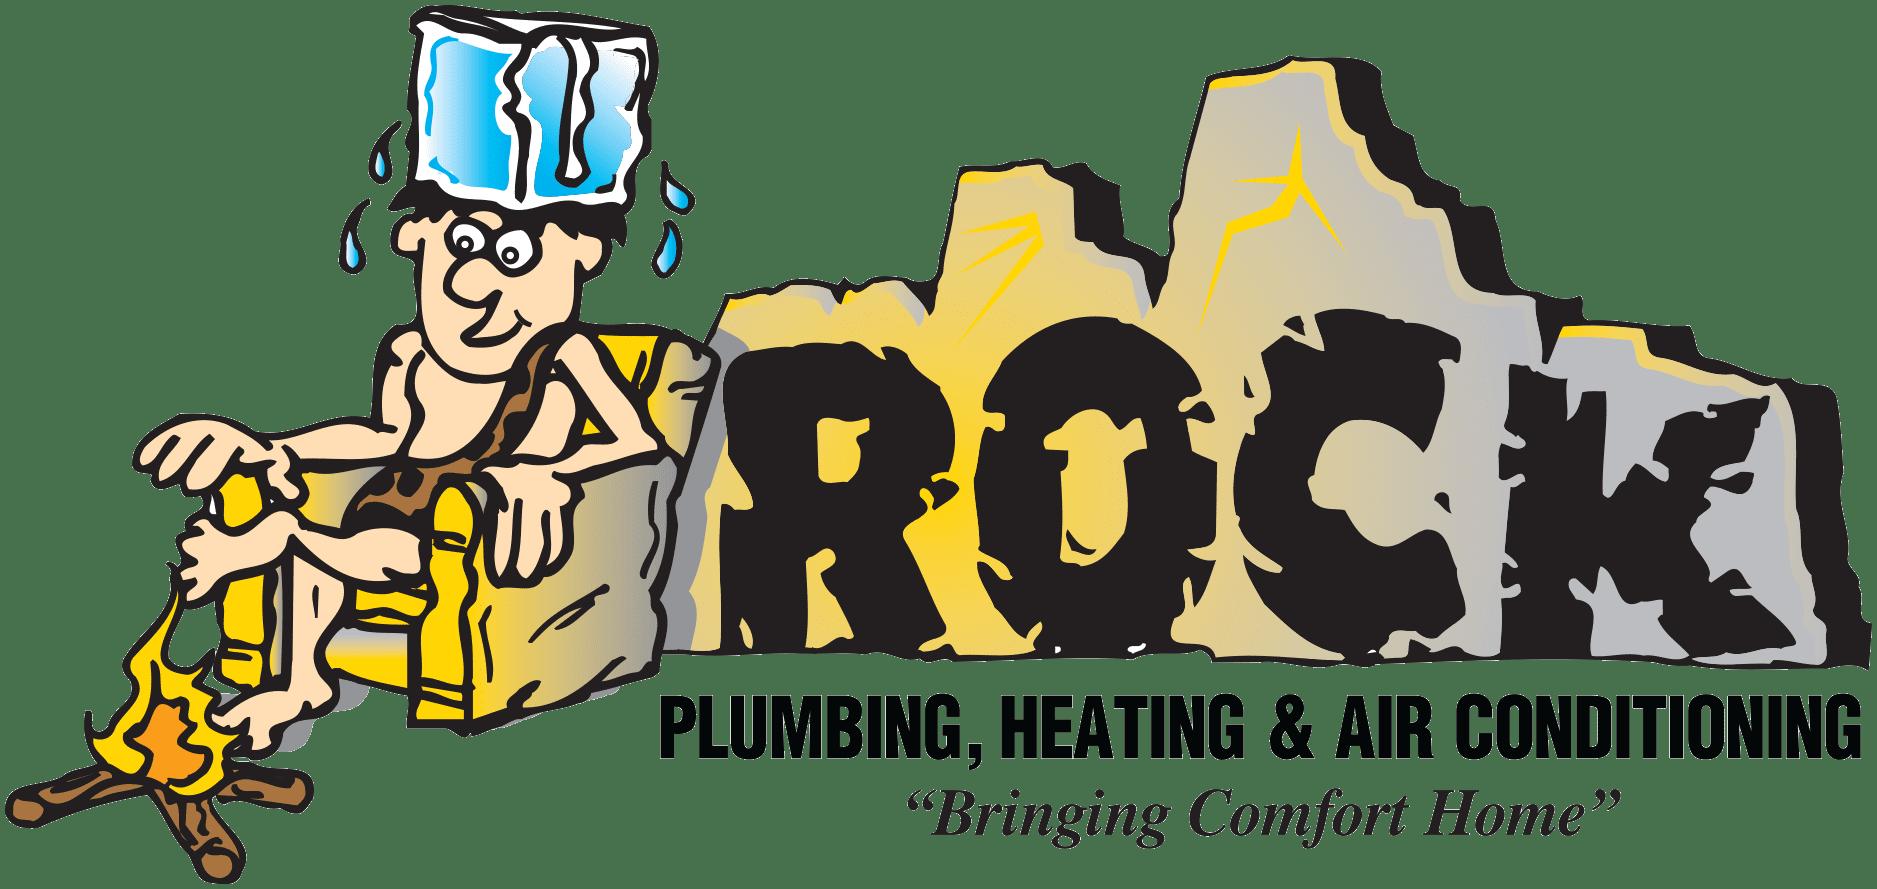 Rock Plumbing, Heating & Air Conditioning